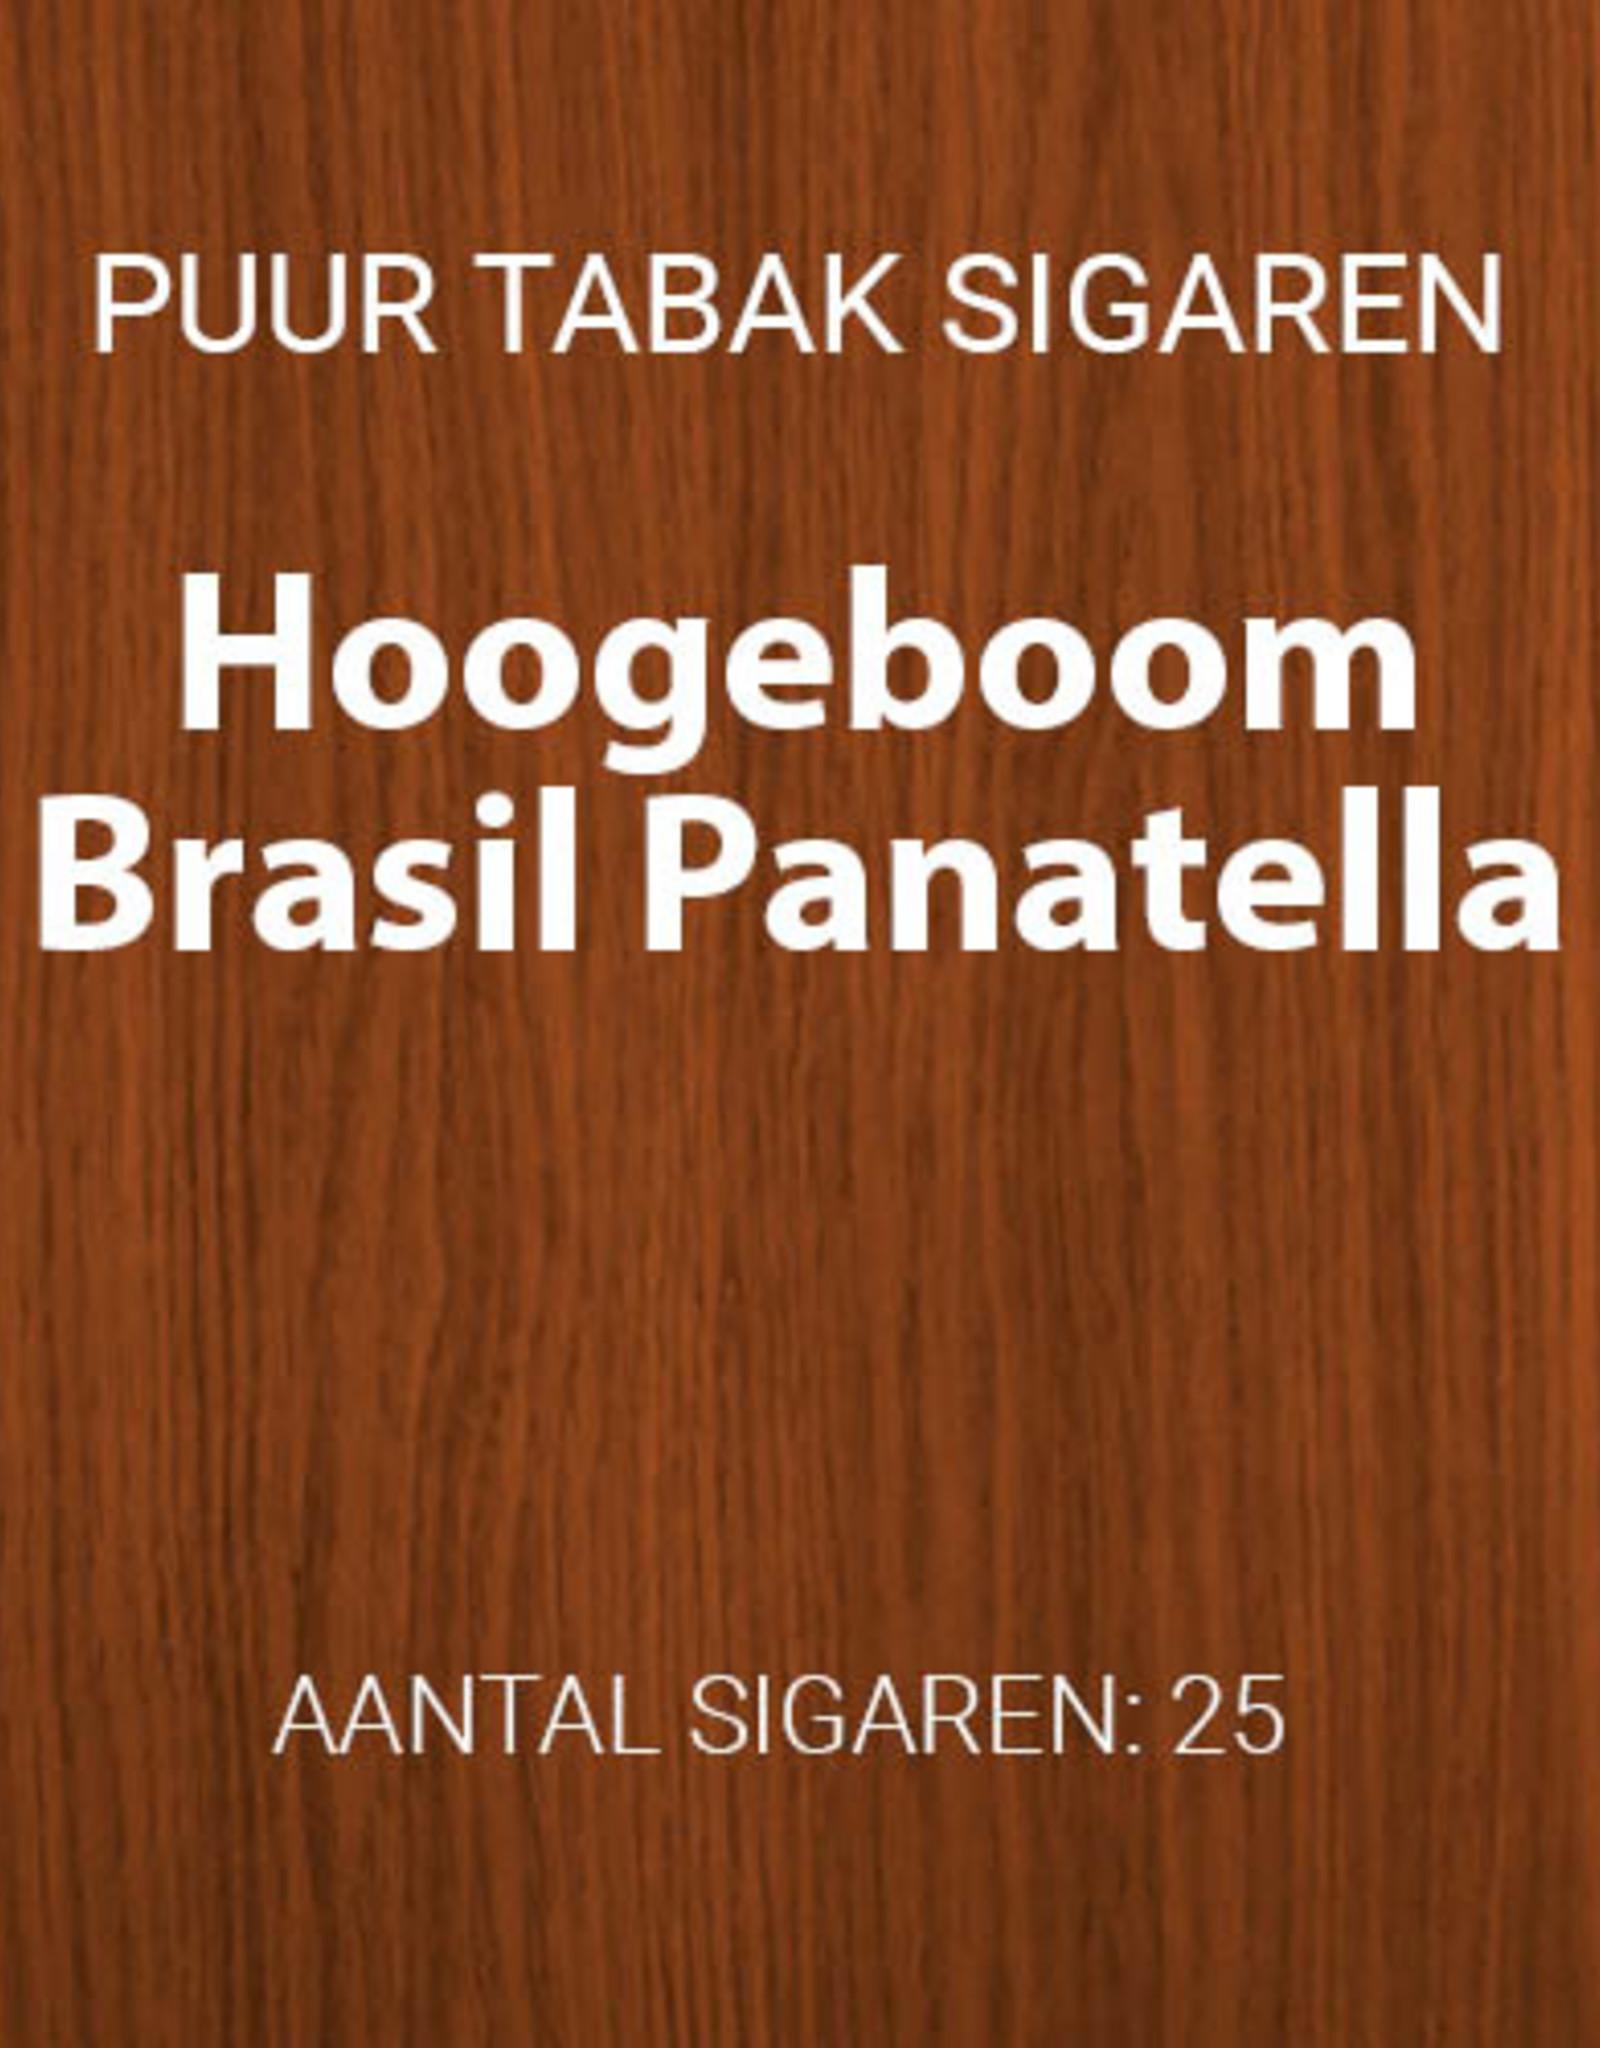 Hoogeboom Brasil Panatella's